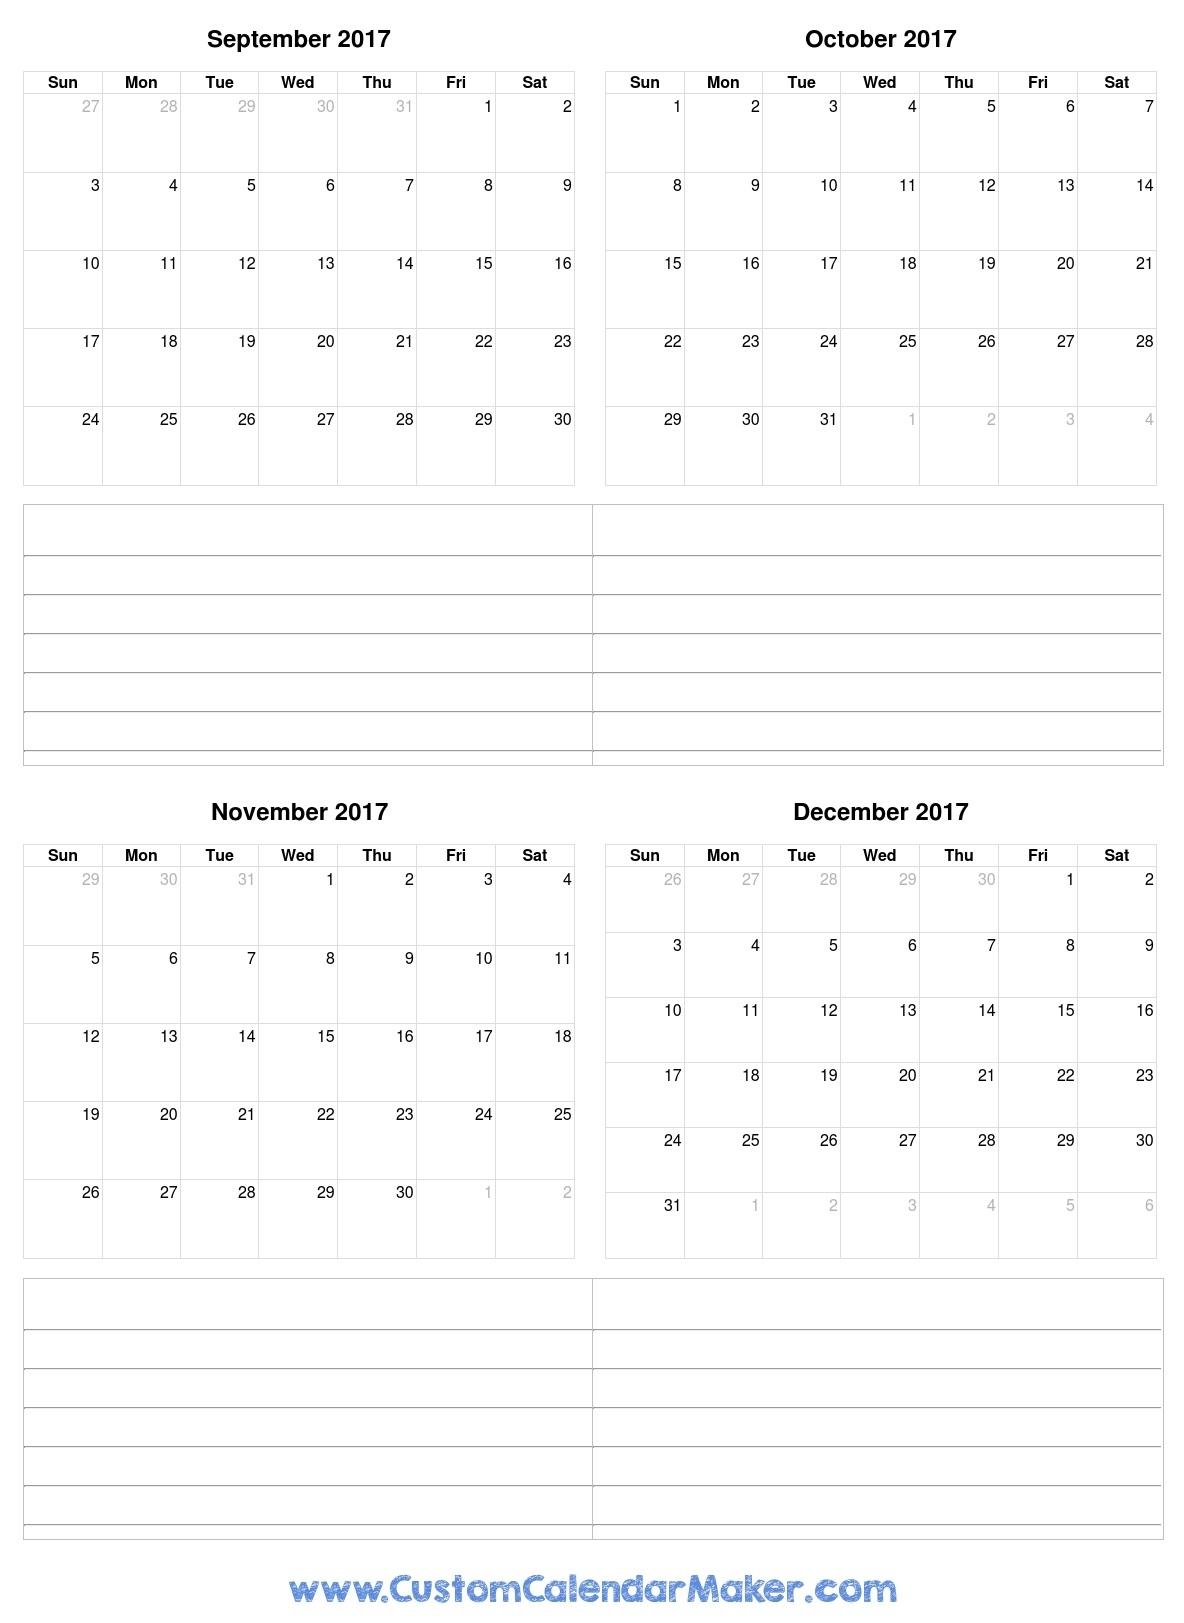 September To December 2017 Calendar Printable For Free inside Calander From August - December